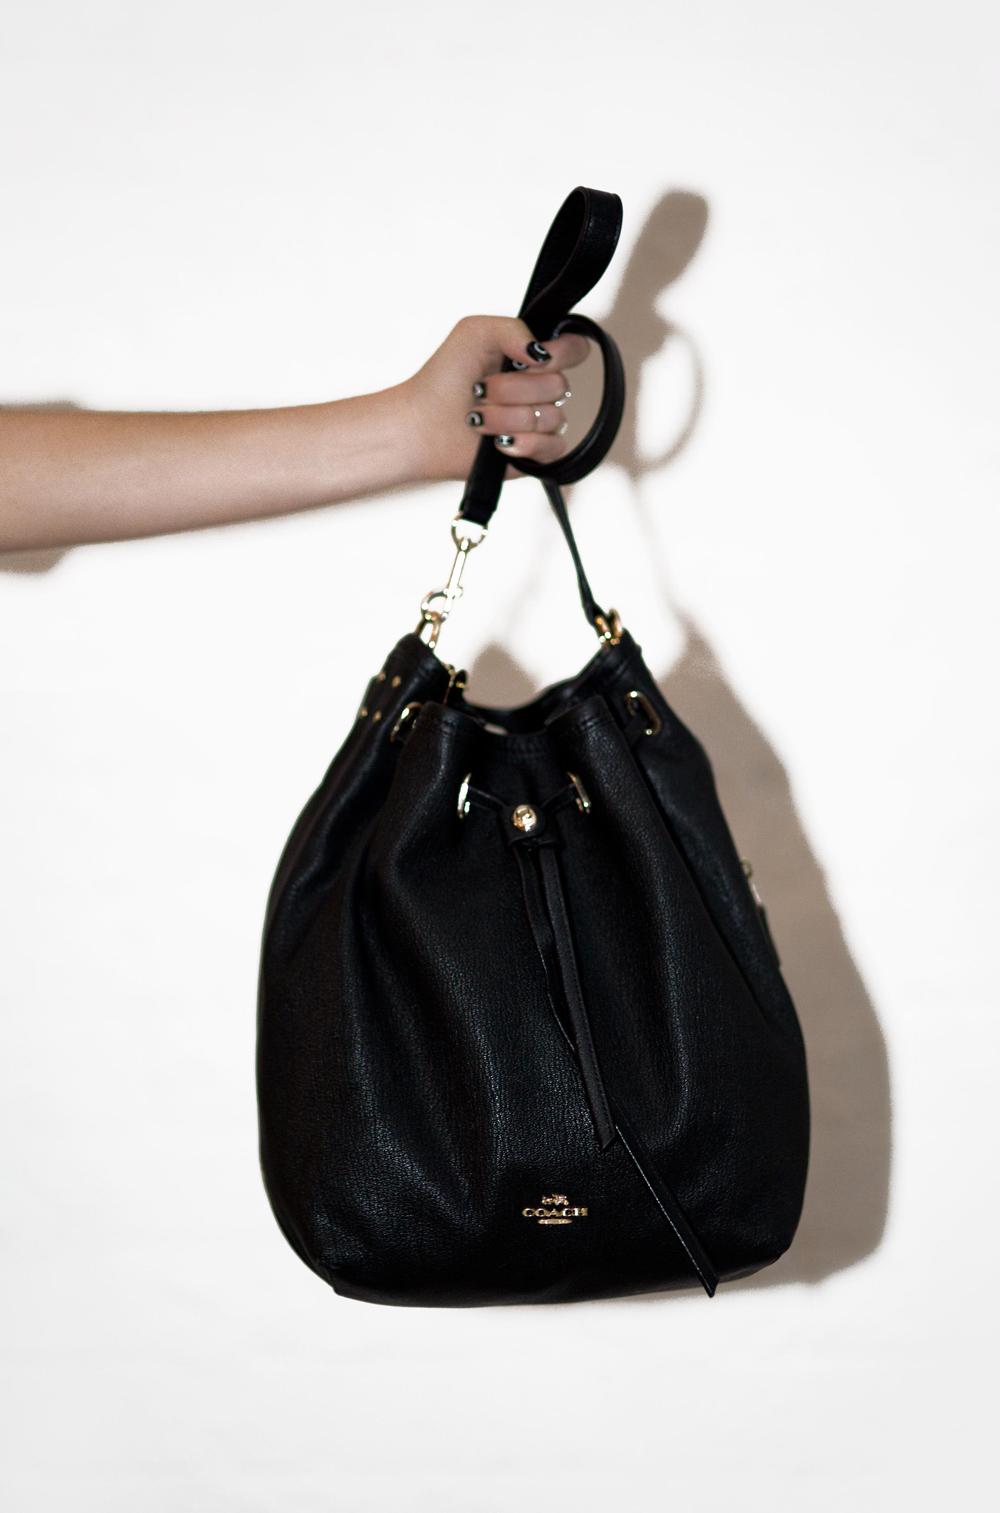 Coach, Coach bag, coach handbag, bag, turn lock bag, black bag, bucket bag, white suit, outfit, oracle fox